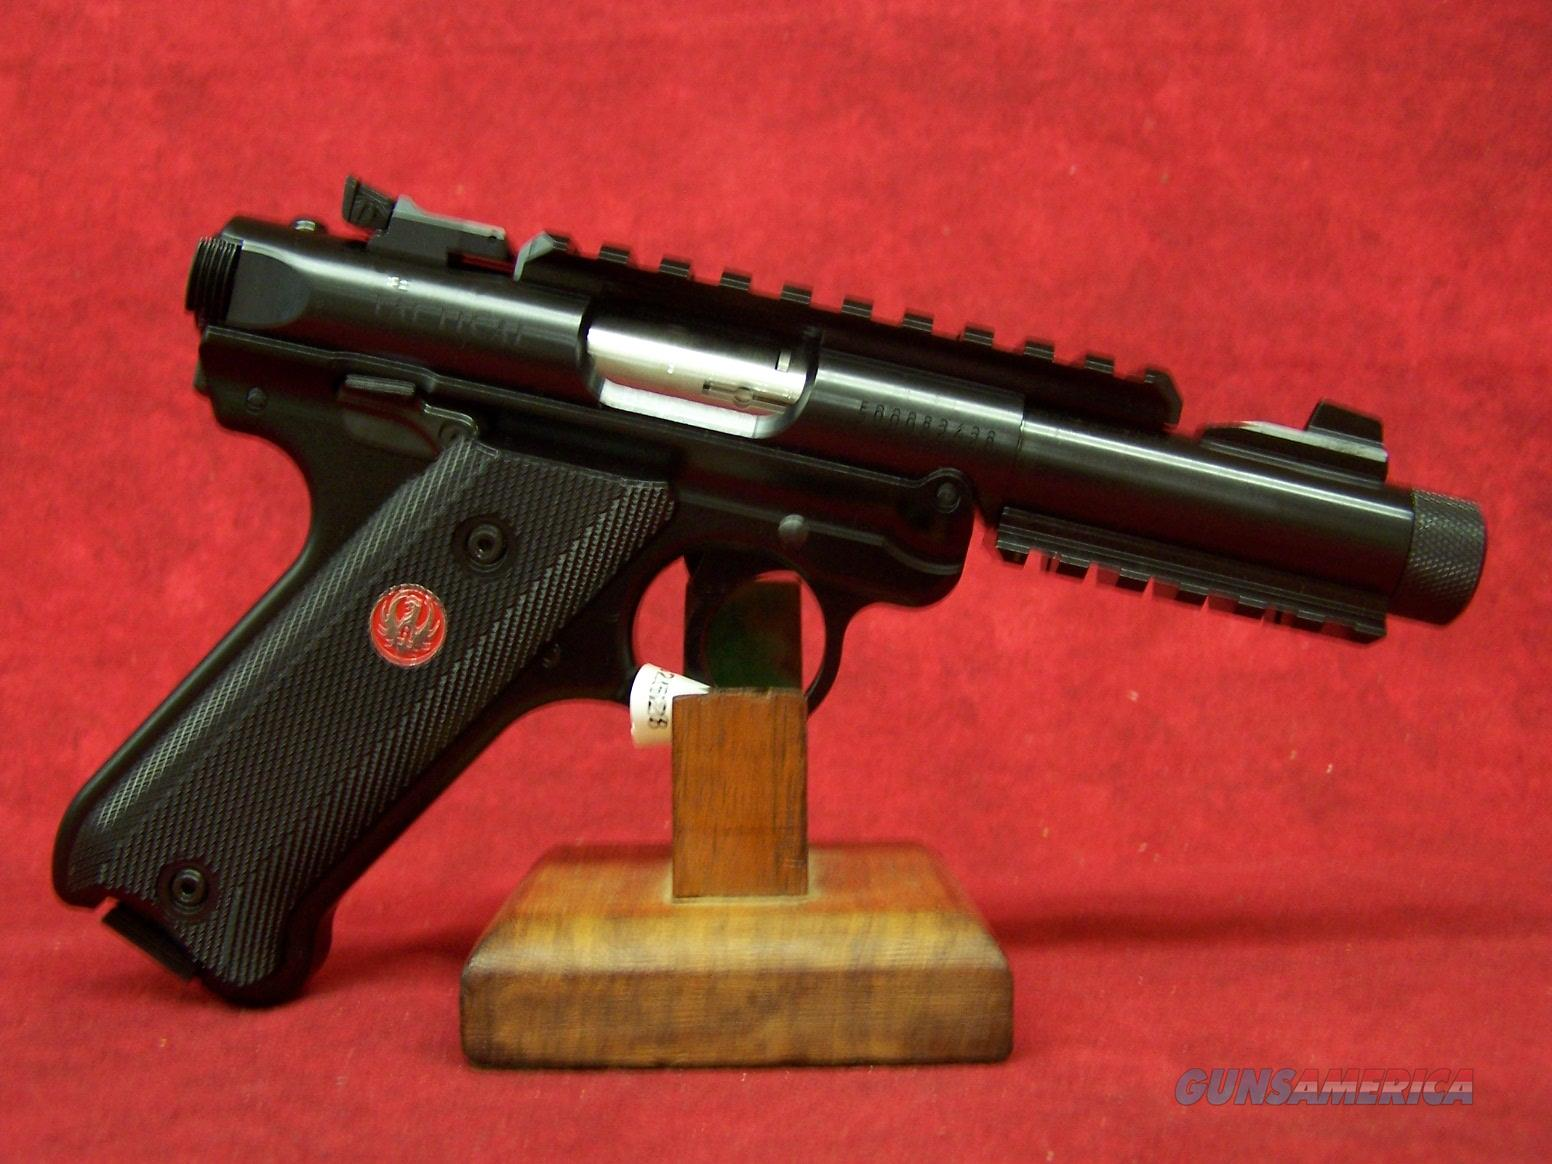 "Ruger Mark IV Tactical Blued .22LR 5.5"" Barrel (40150)  Guns > Pistols > Ruger Semi-Auto Pistols > Mark I/II/III/IV Family"